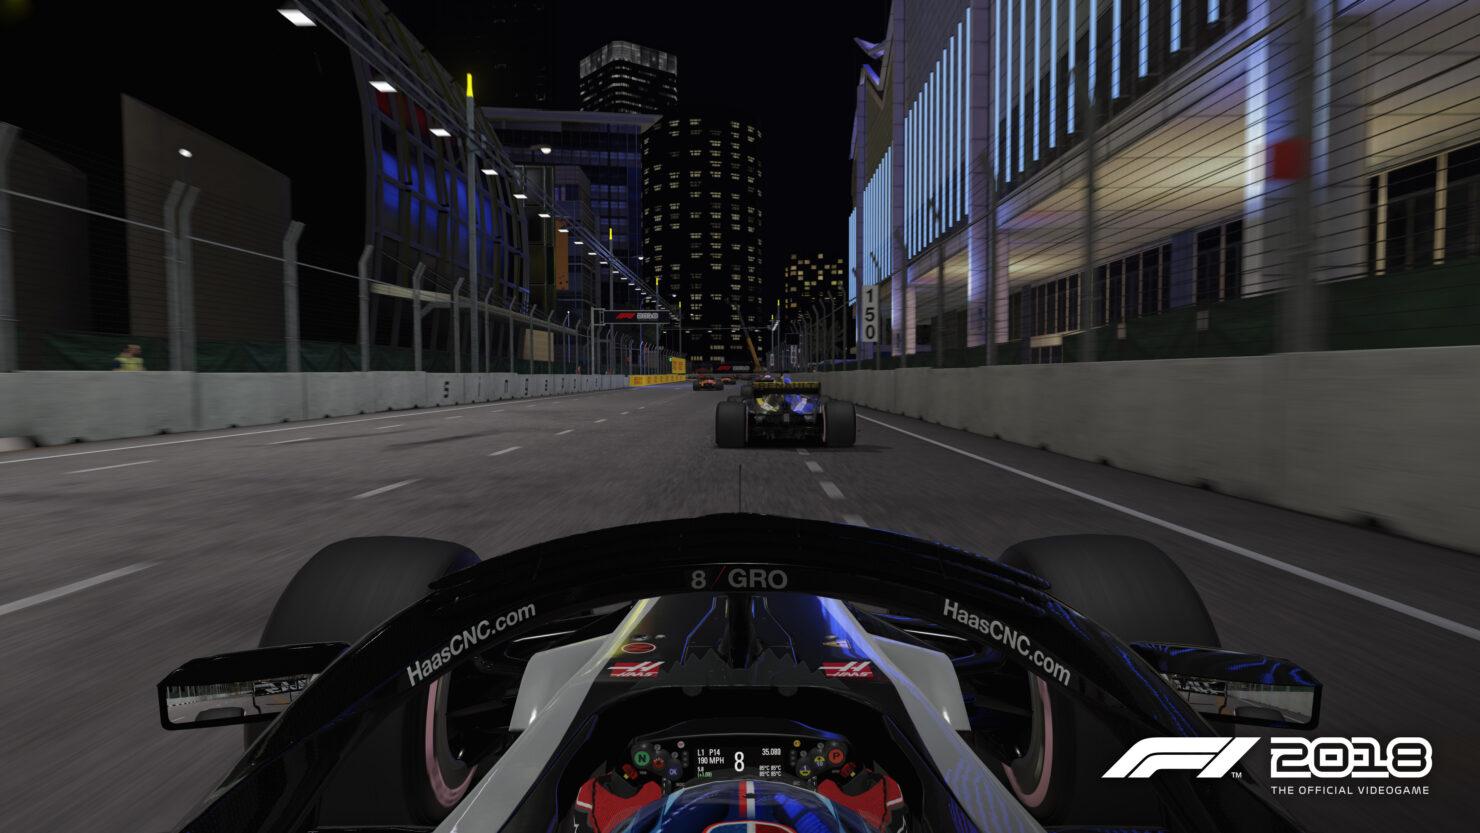 f1-2019-night-lighting-comparison-03-part-3-singapore-2018-02